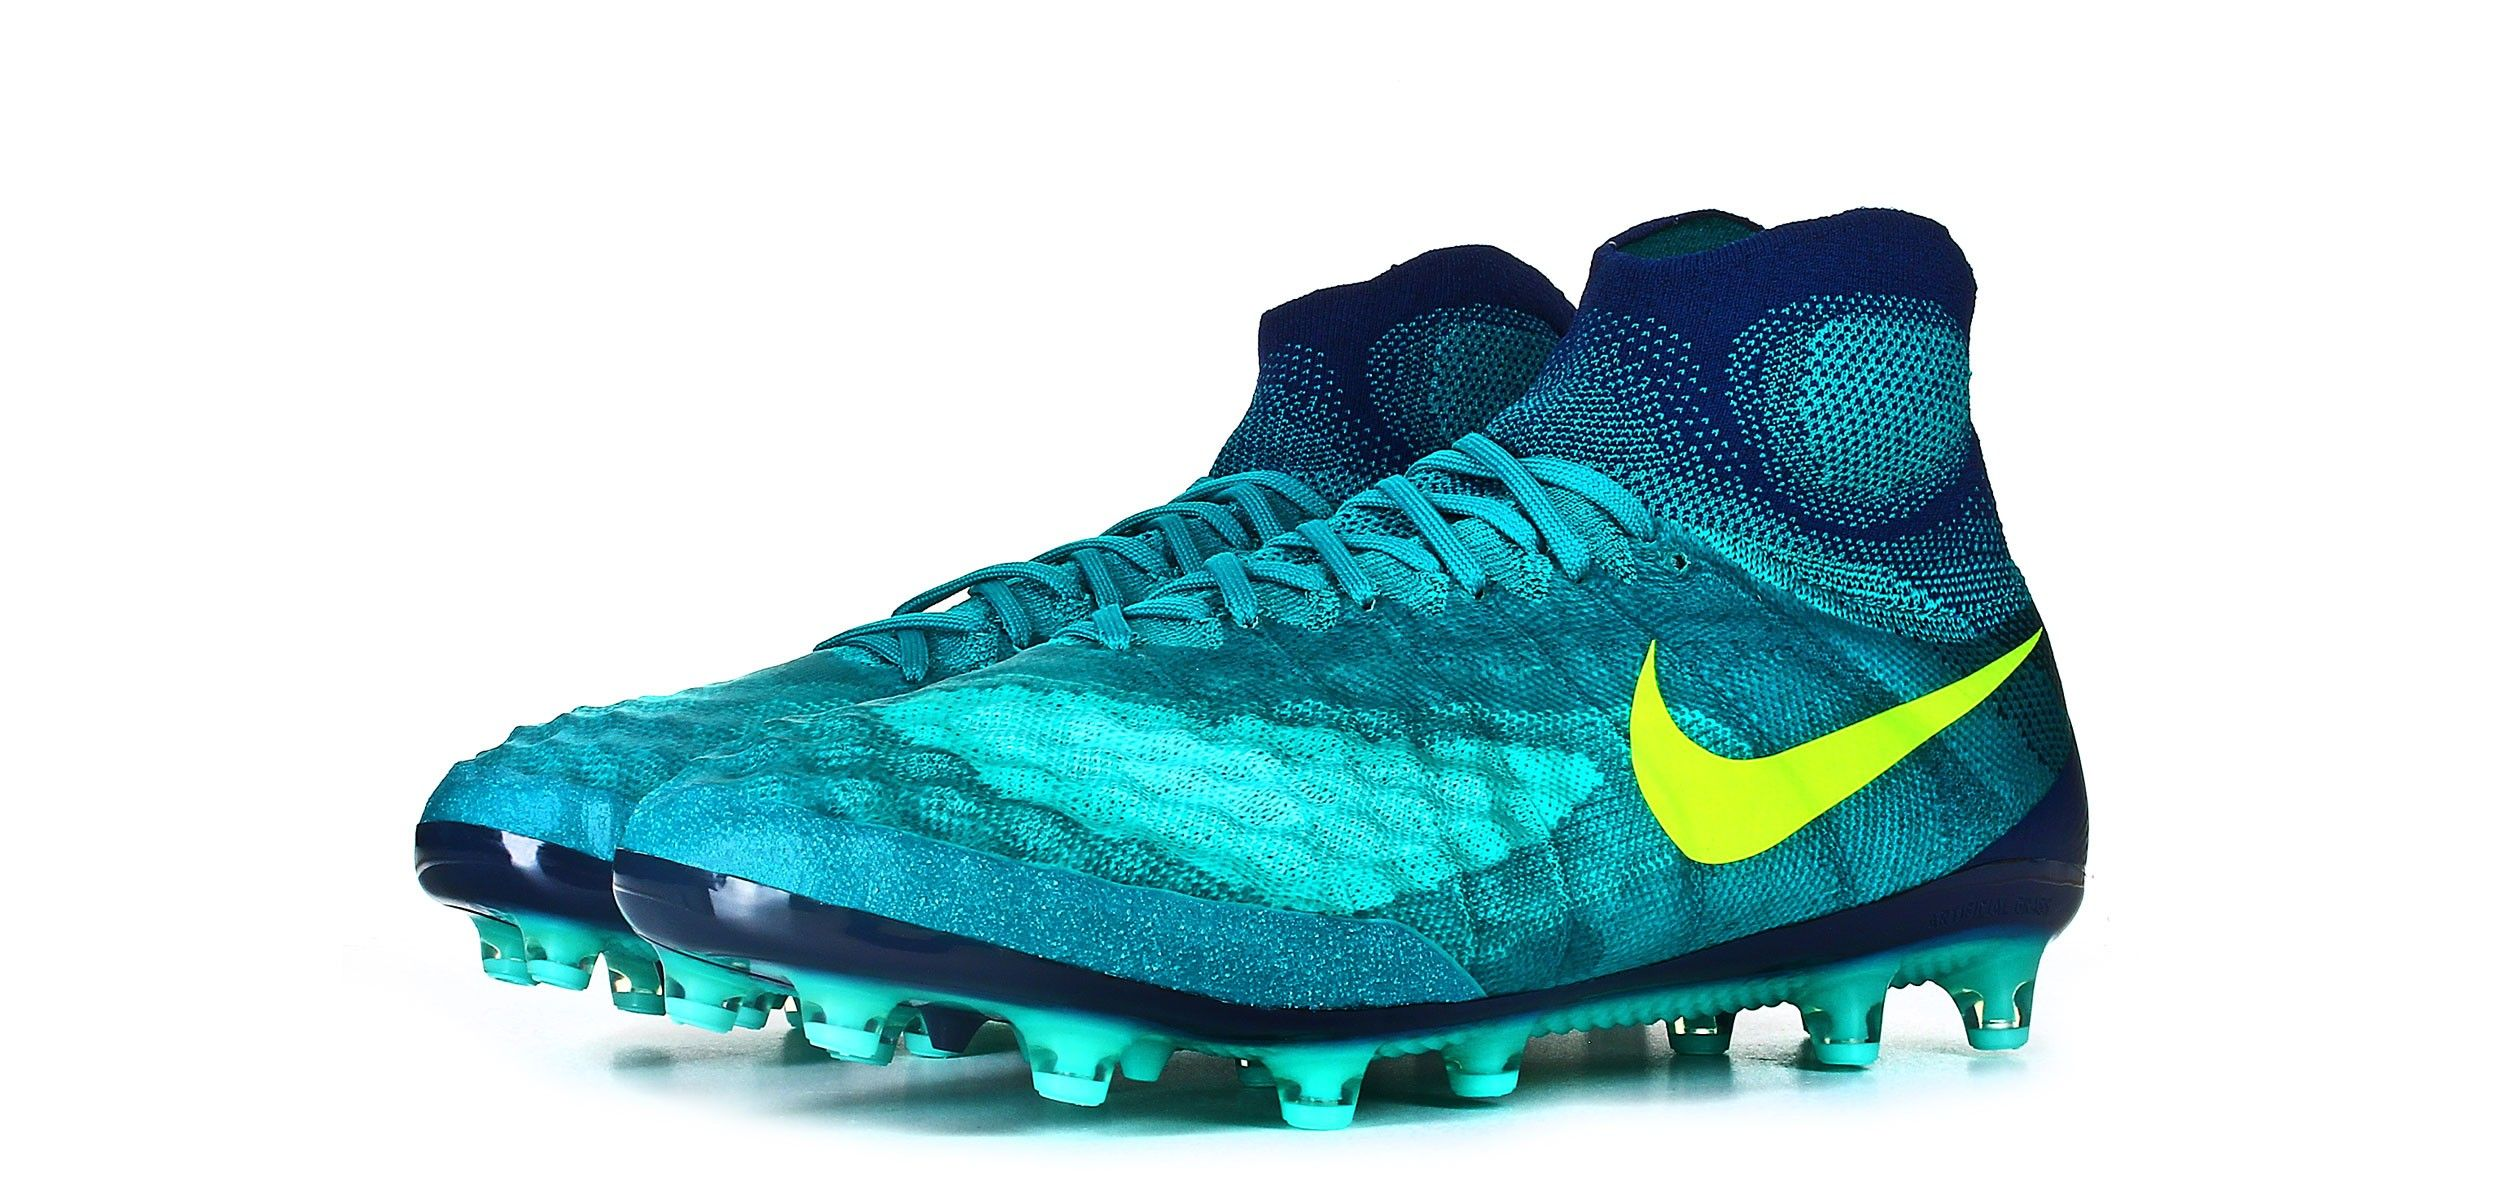 Botas de fútbol Nike Magista Obra II AG-PRO - Verde Azulado - perspectiva  conjunto d133933ca2d92